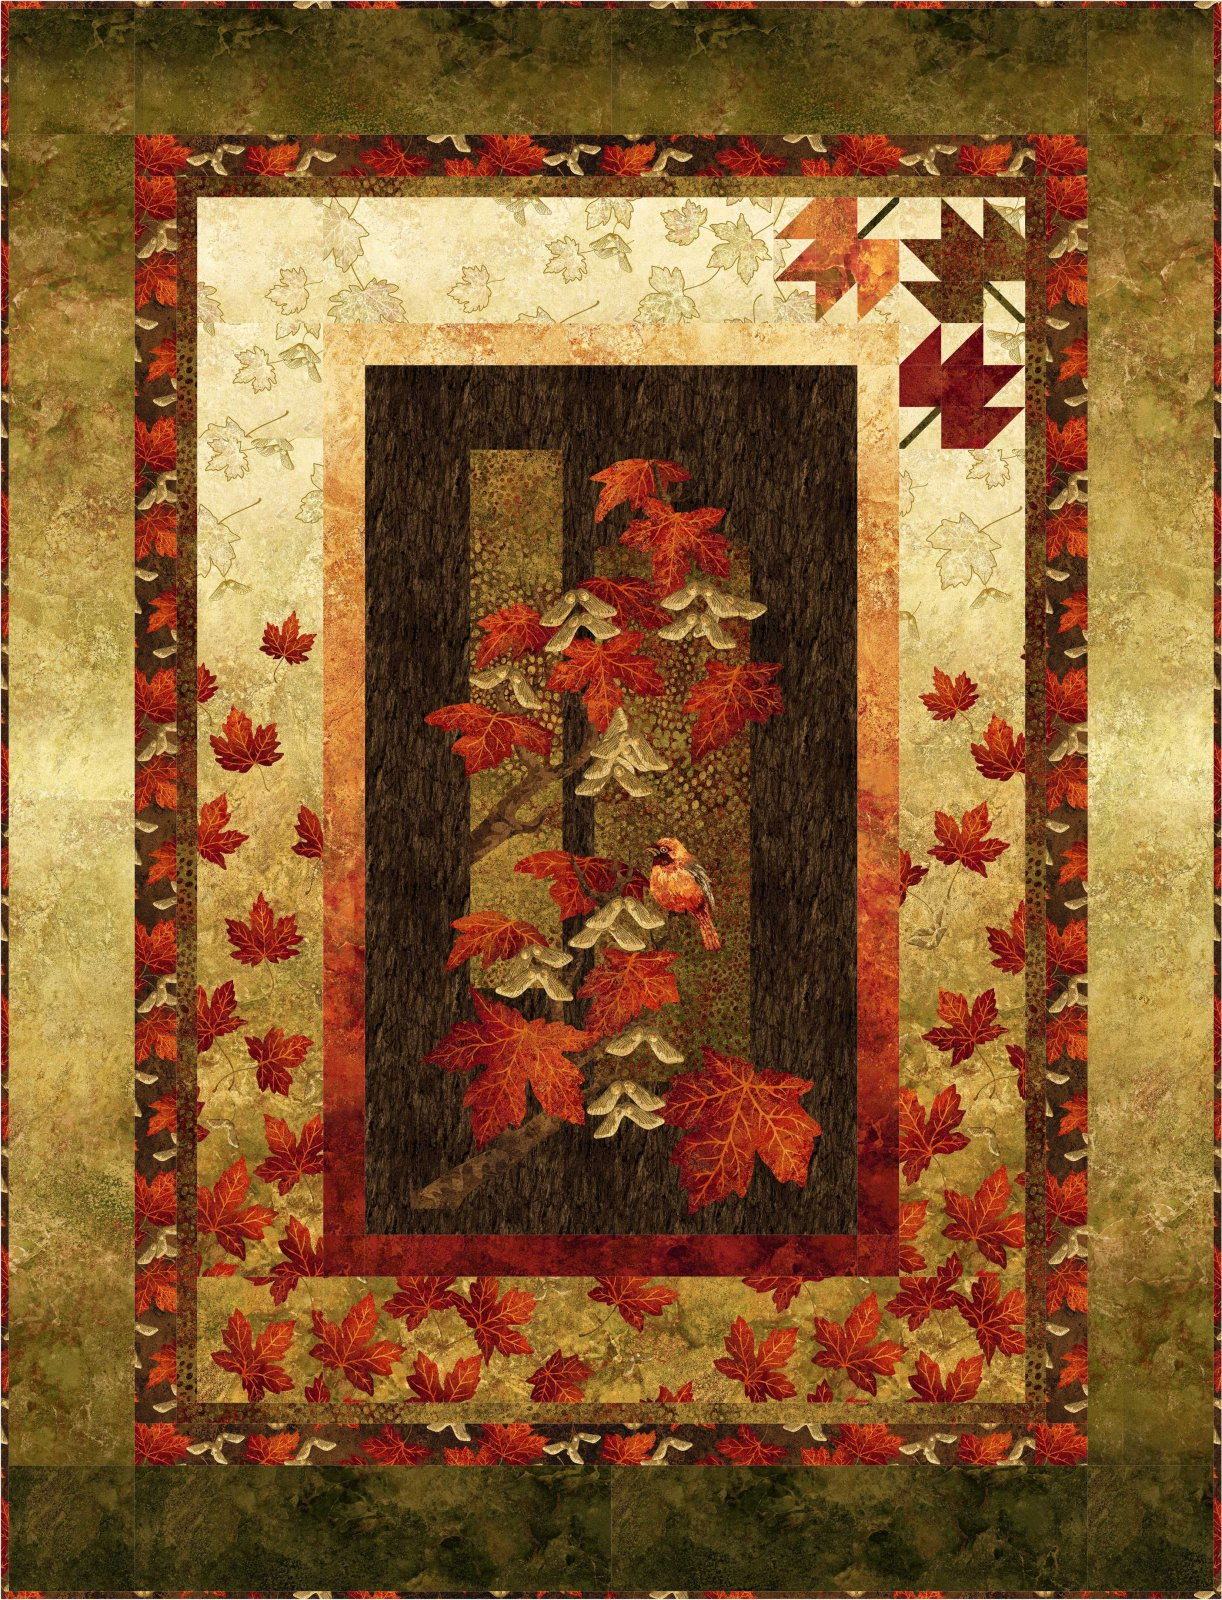 Autumn Splendor Throw/Lap kit - red